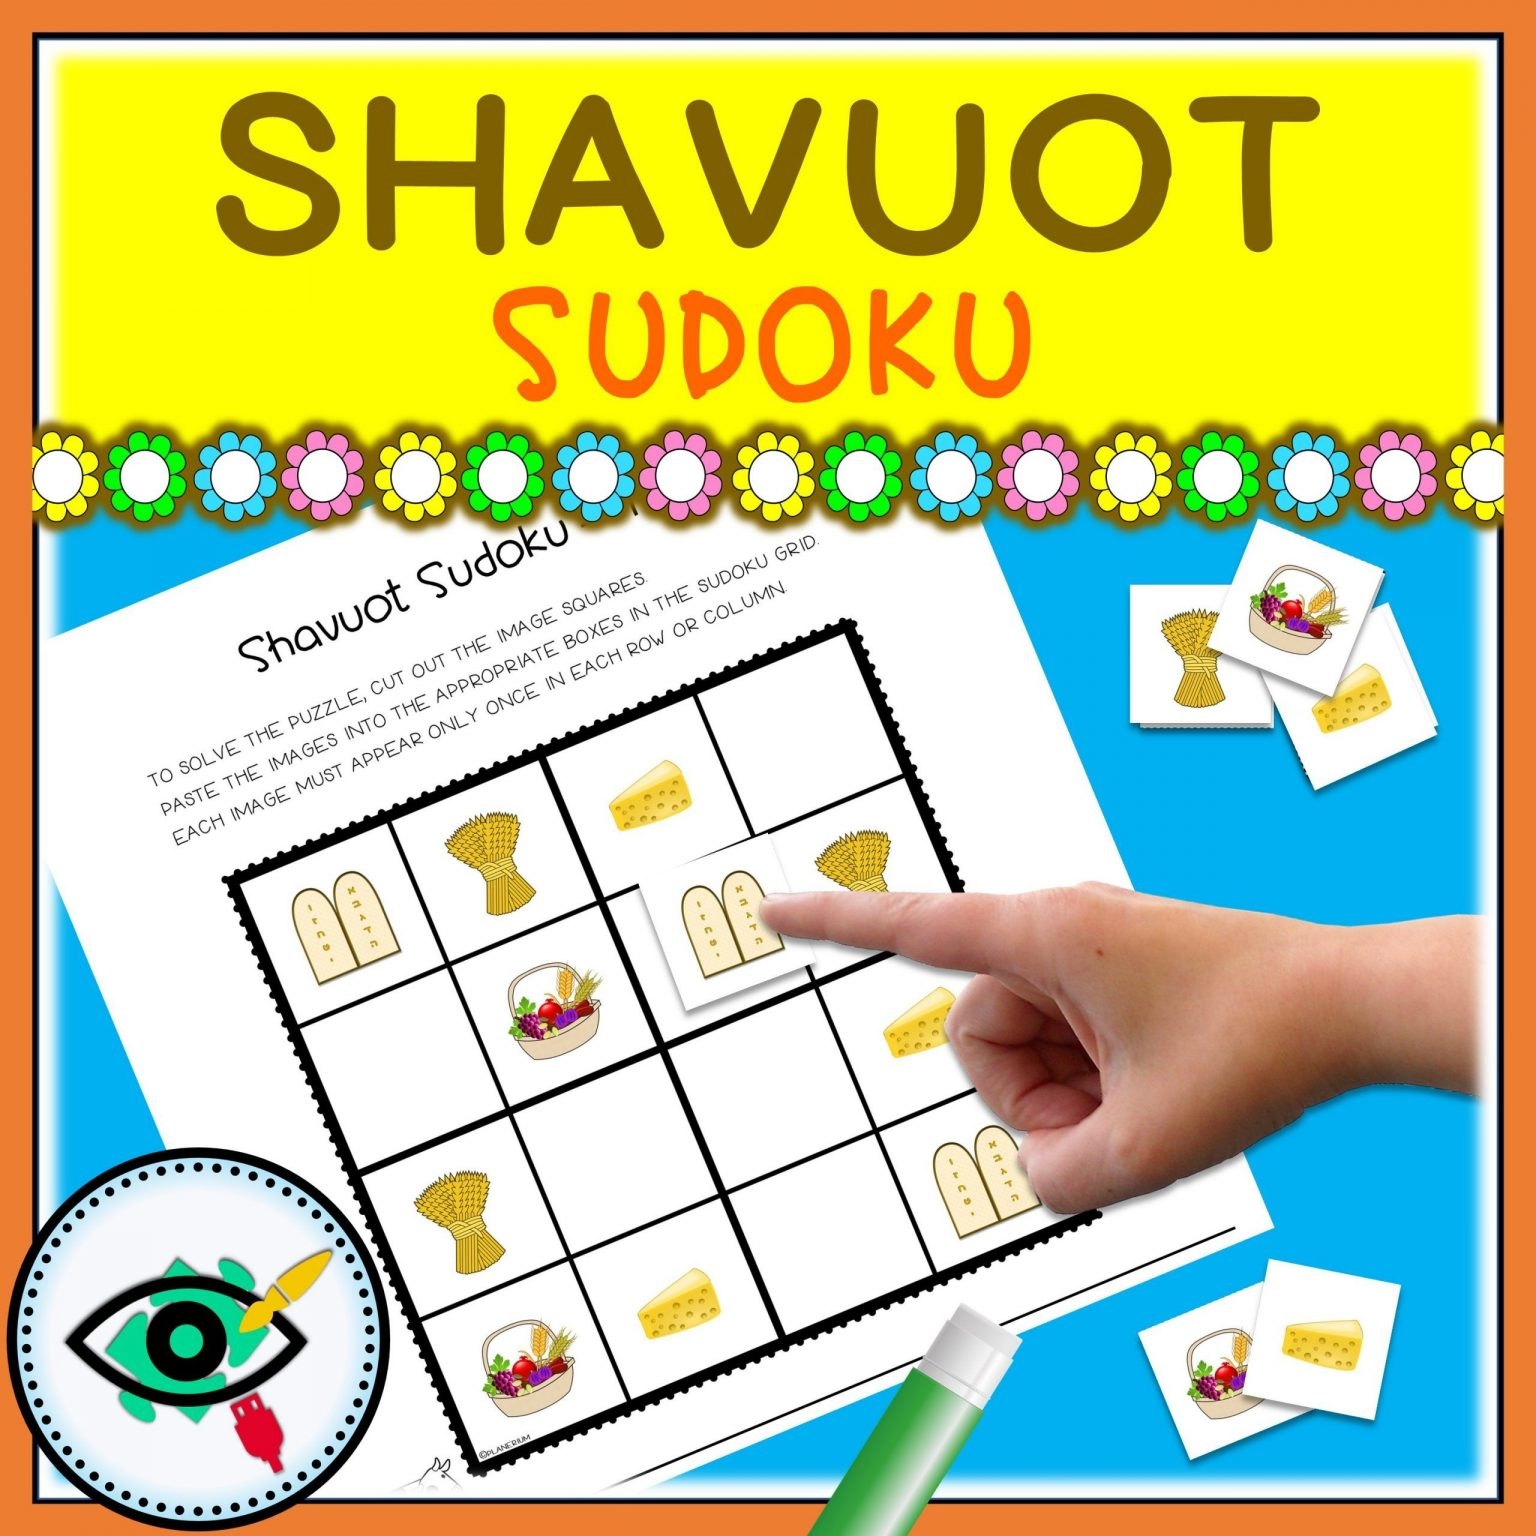 Shavuot - Sudoku Puzzle Game - Title 5